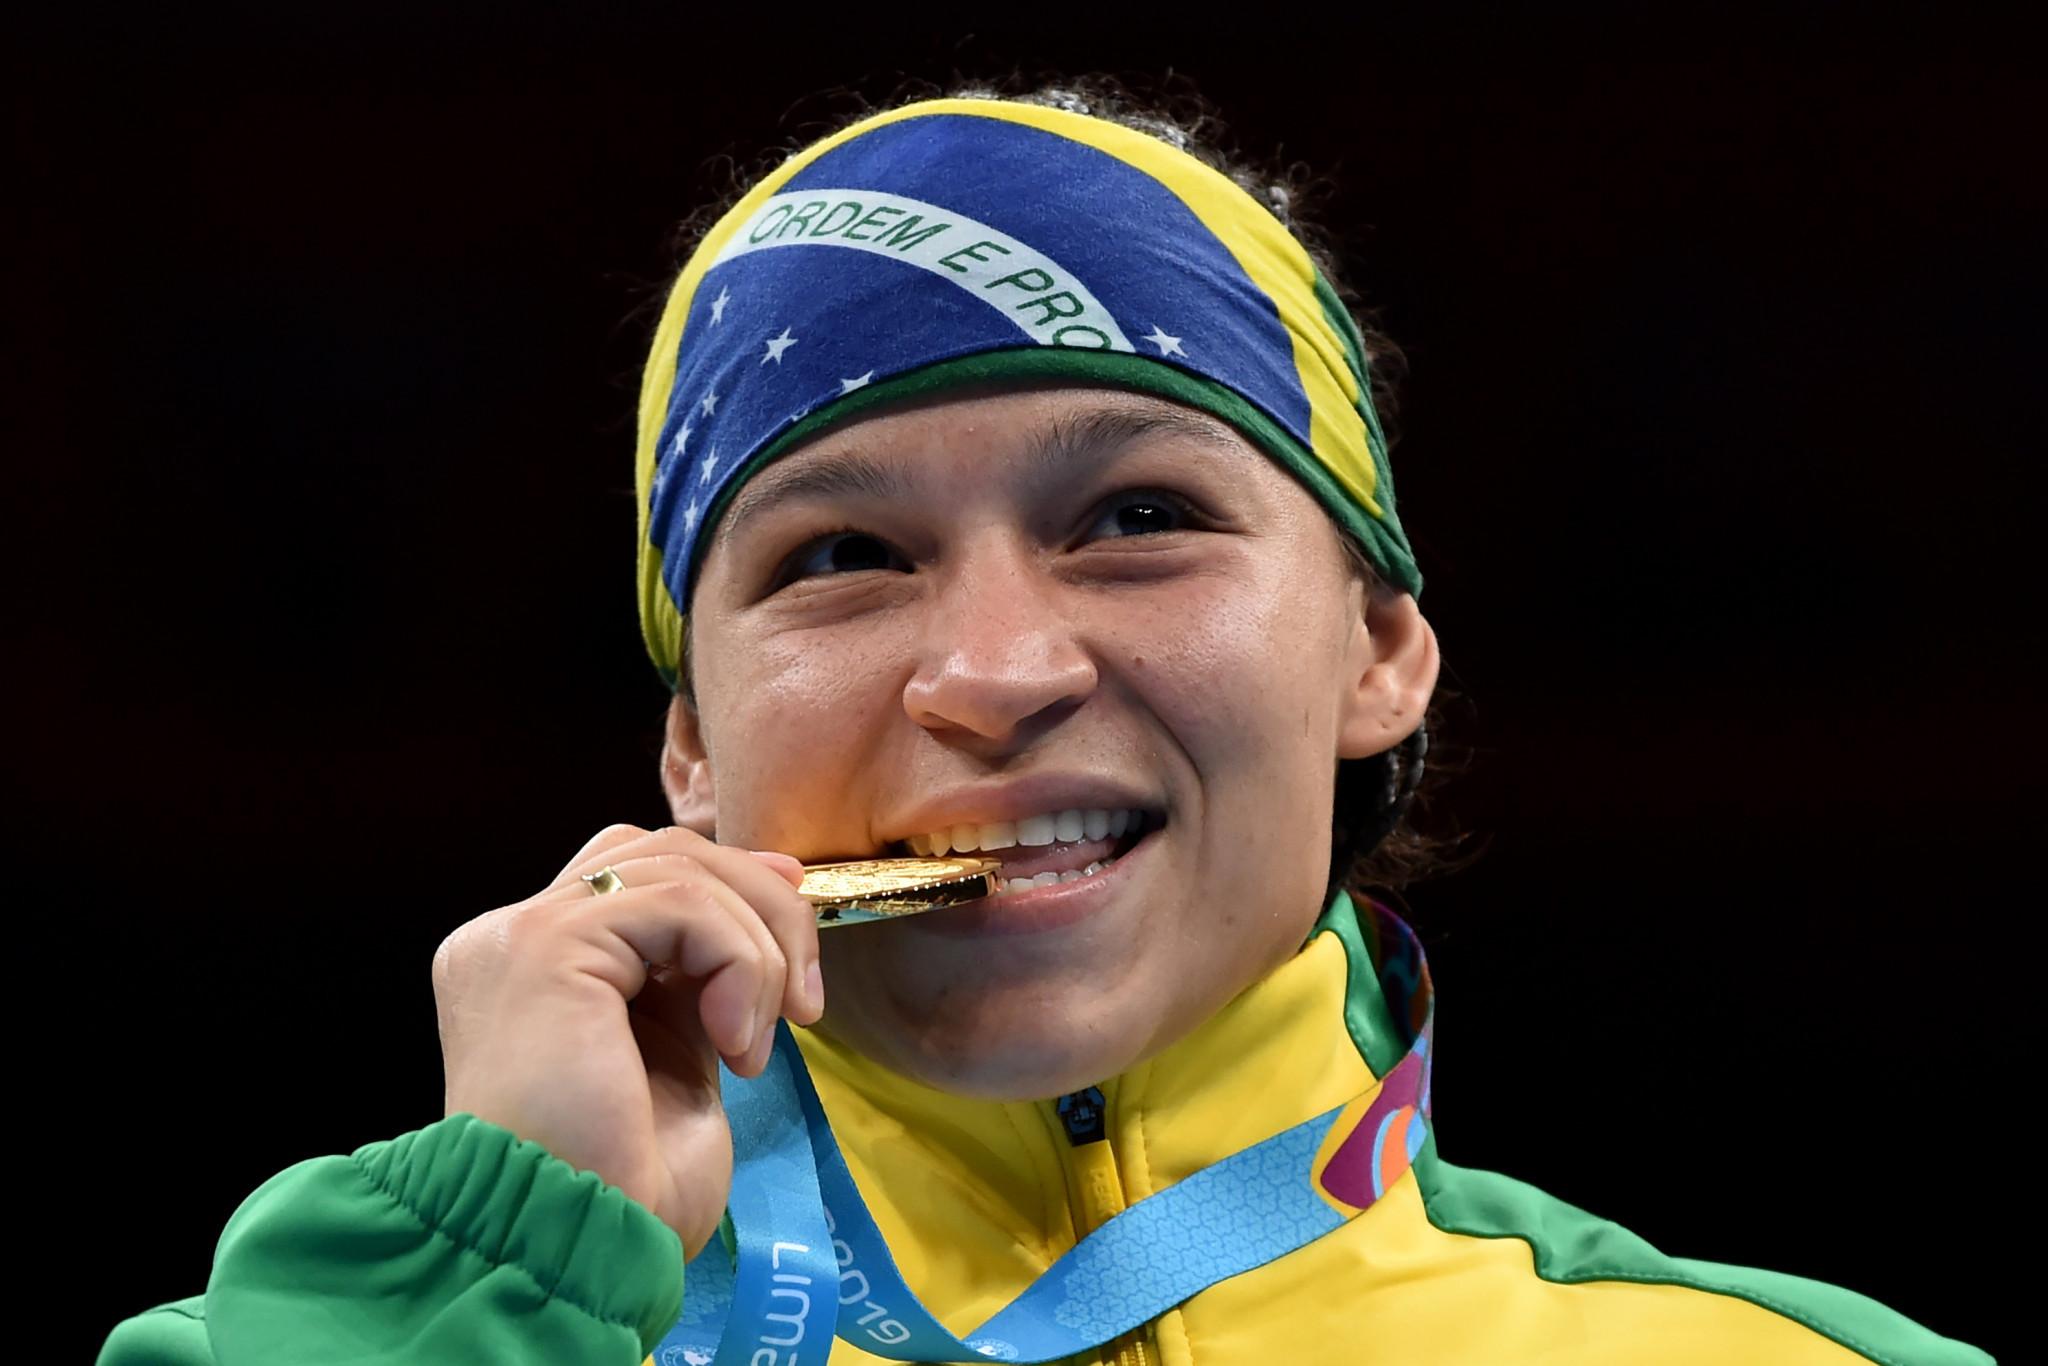 World champion Ferreira becomes ambassador for AIBA Youth World Boxing Championships